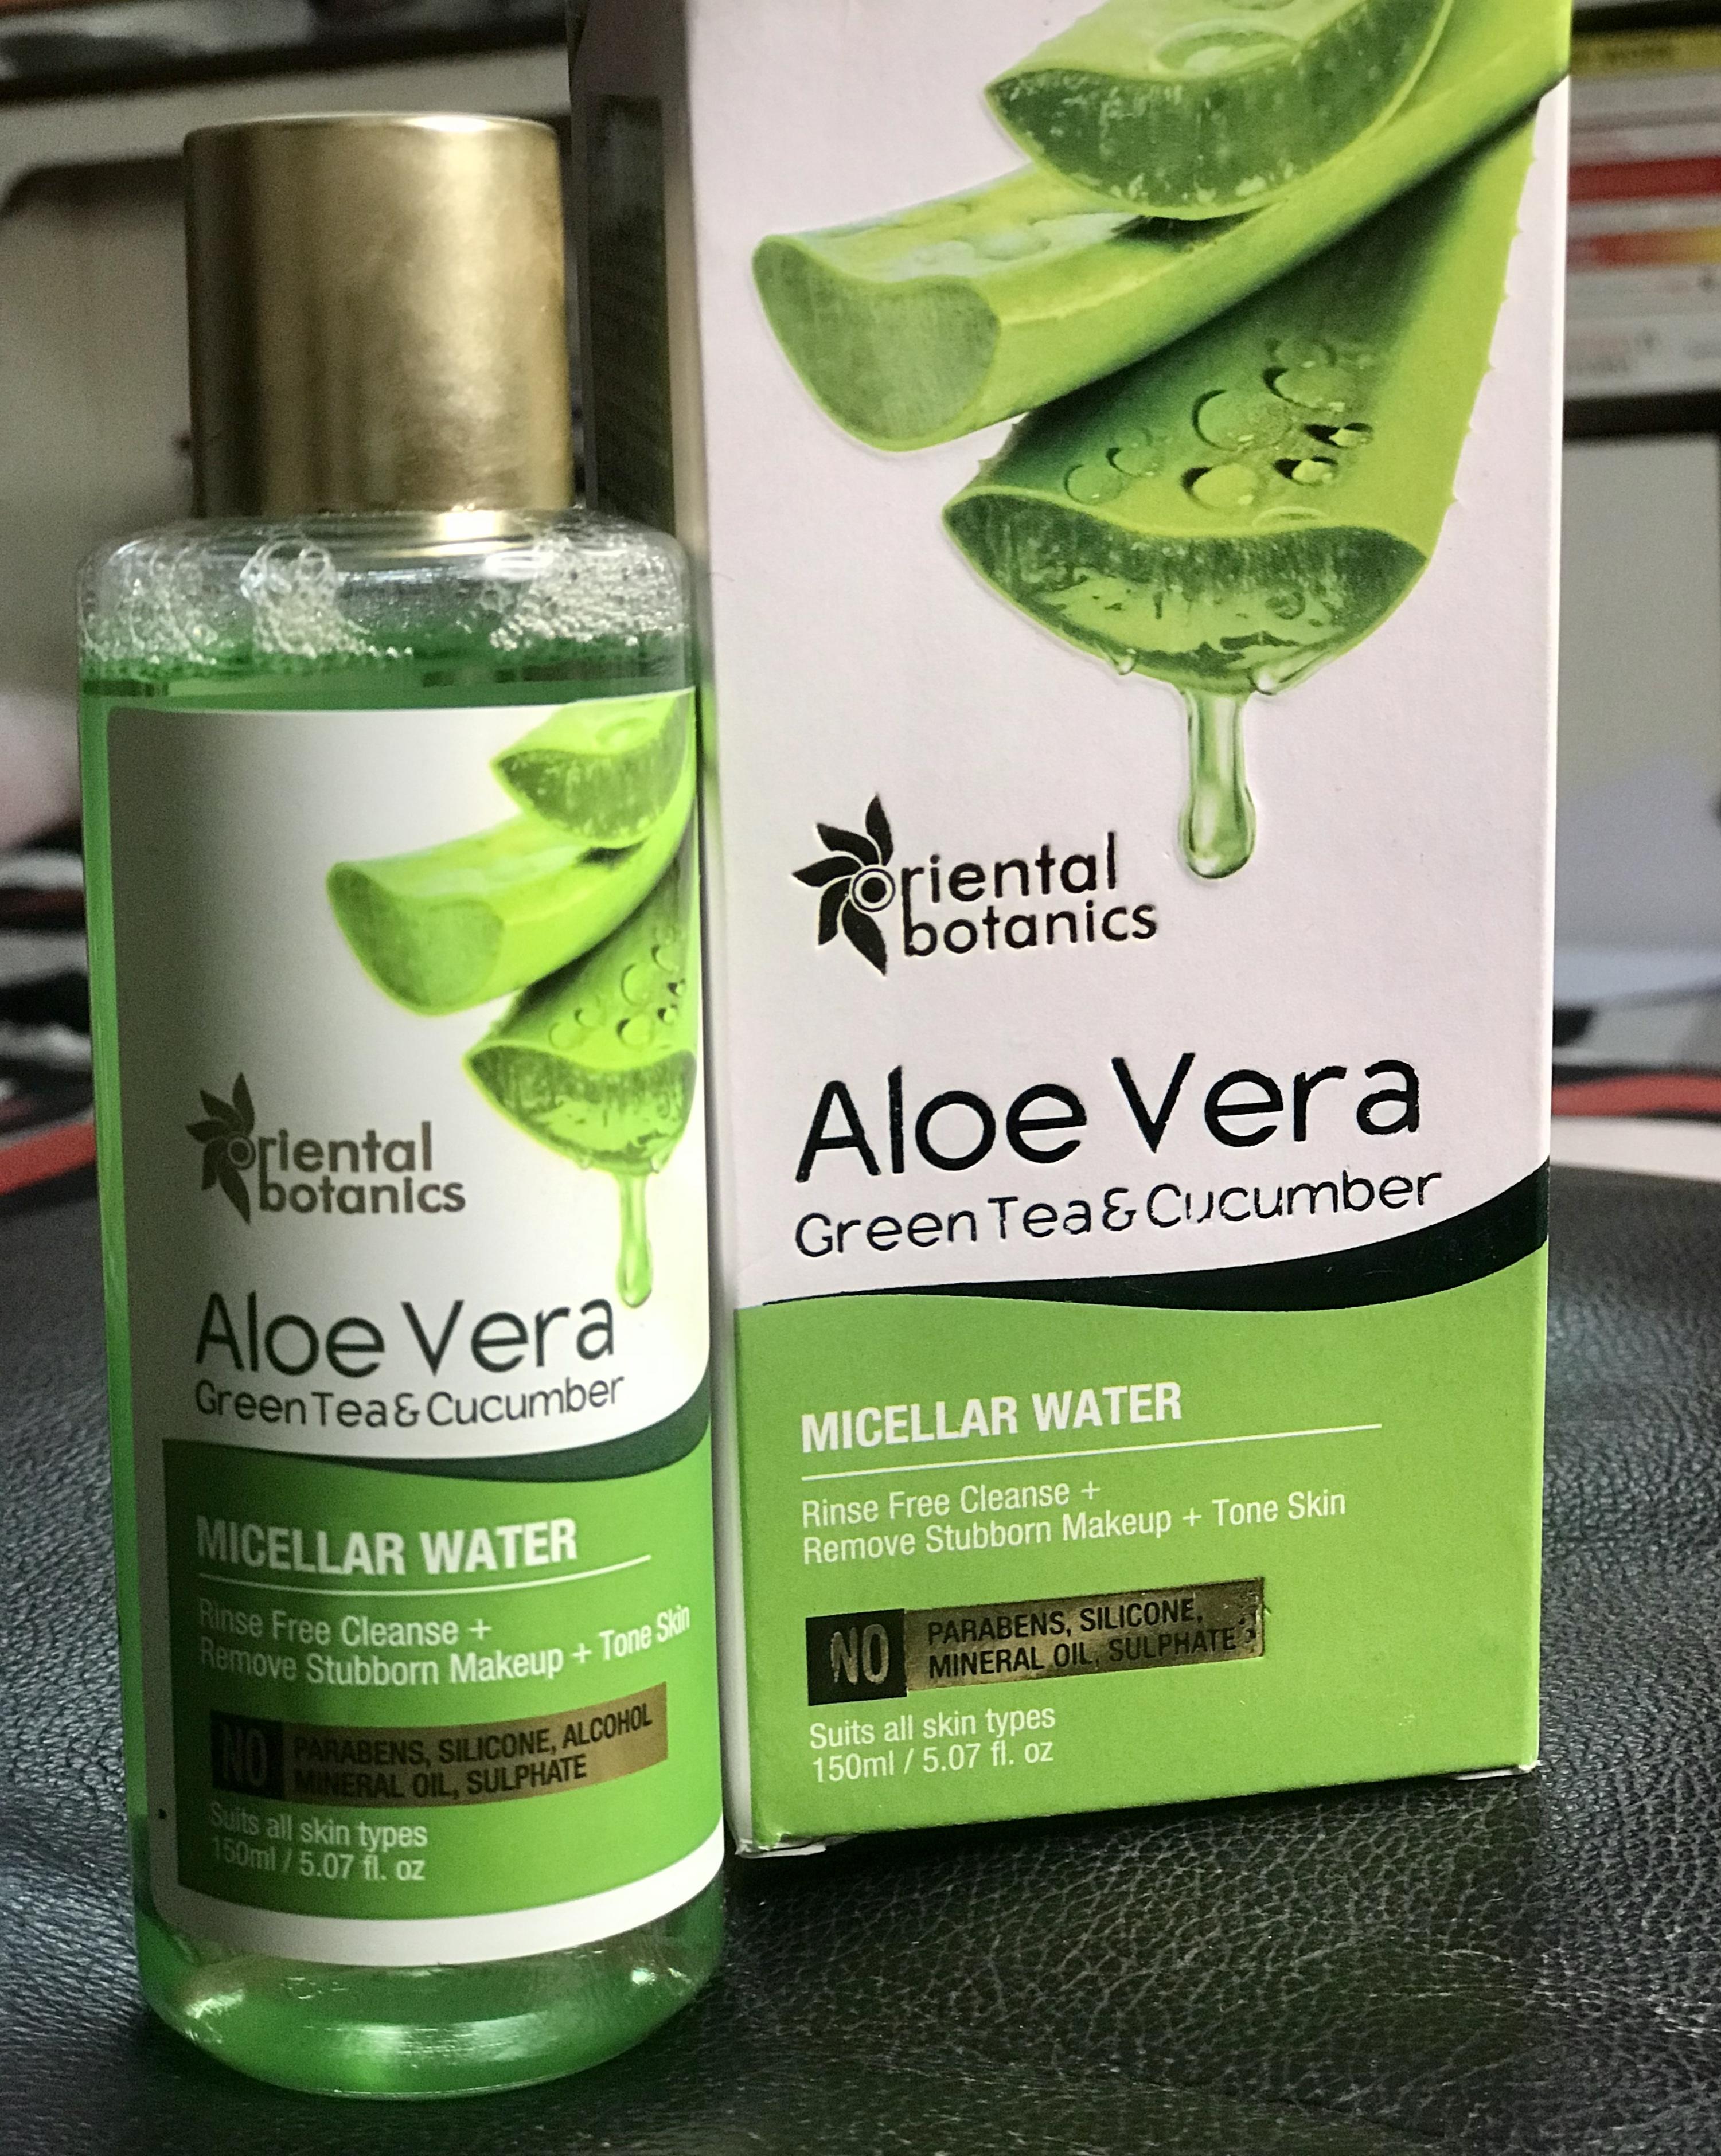 Oriental Botanics Aloe Vera, Green Tea & Cucumber Face Toner pic 2-Highly Recommended-By himanshiahuja